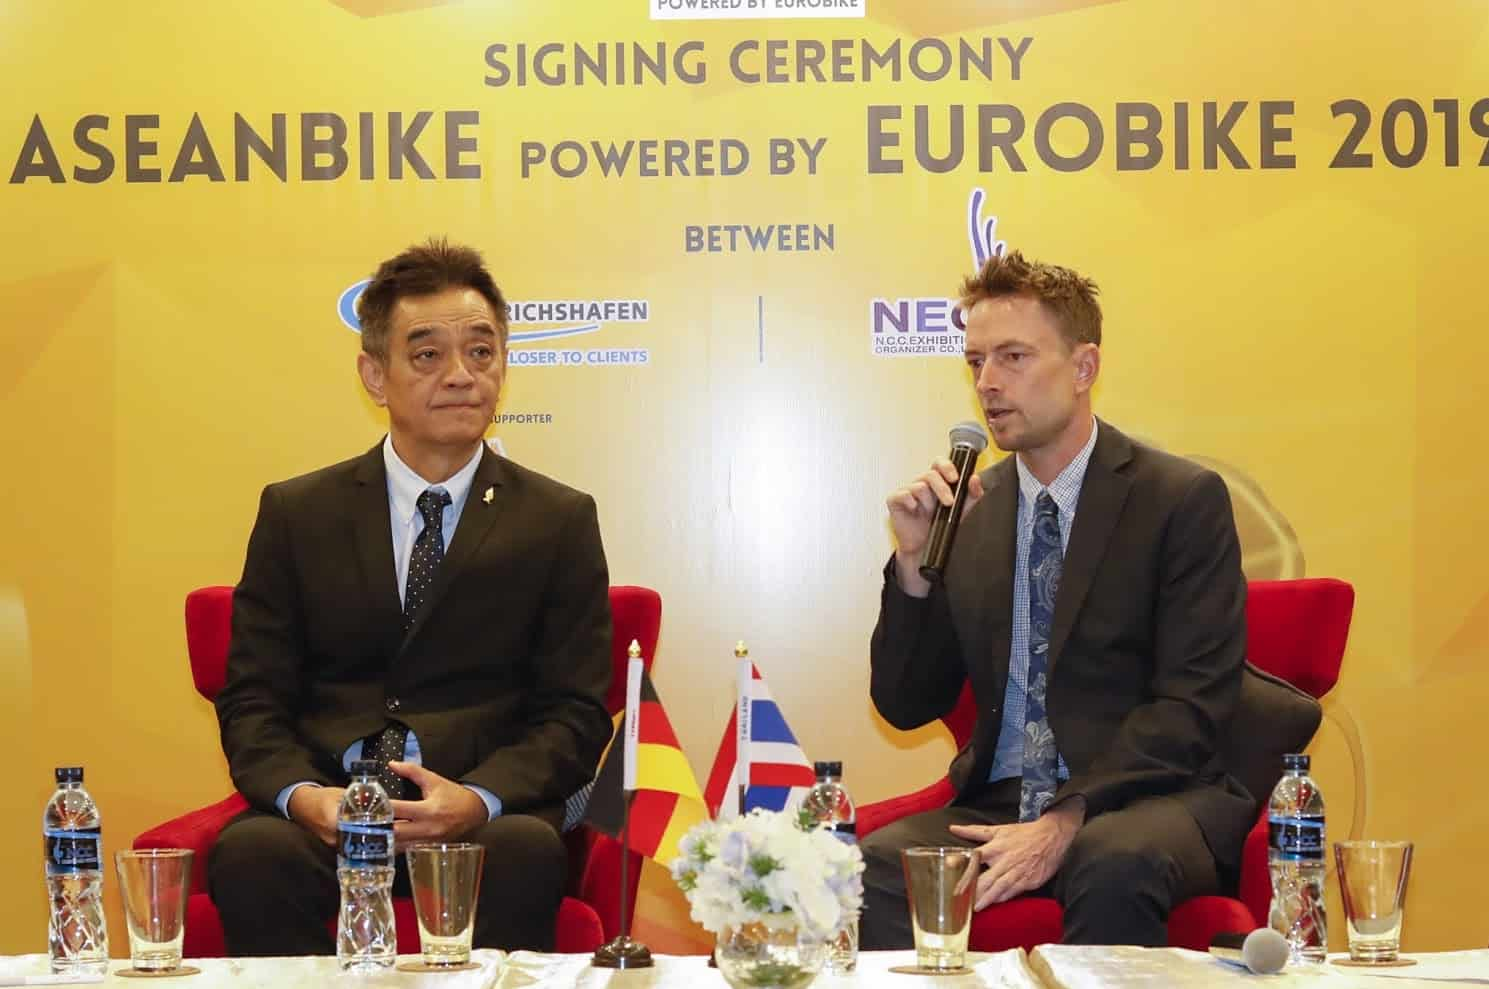 Stefan Reisinger (R), Head of EUROBIKE, and Sakchai Pattarapreechakul, President of N.C.C. Exhibition Organization Co.,Ltd.